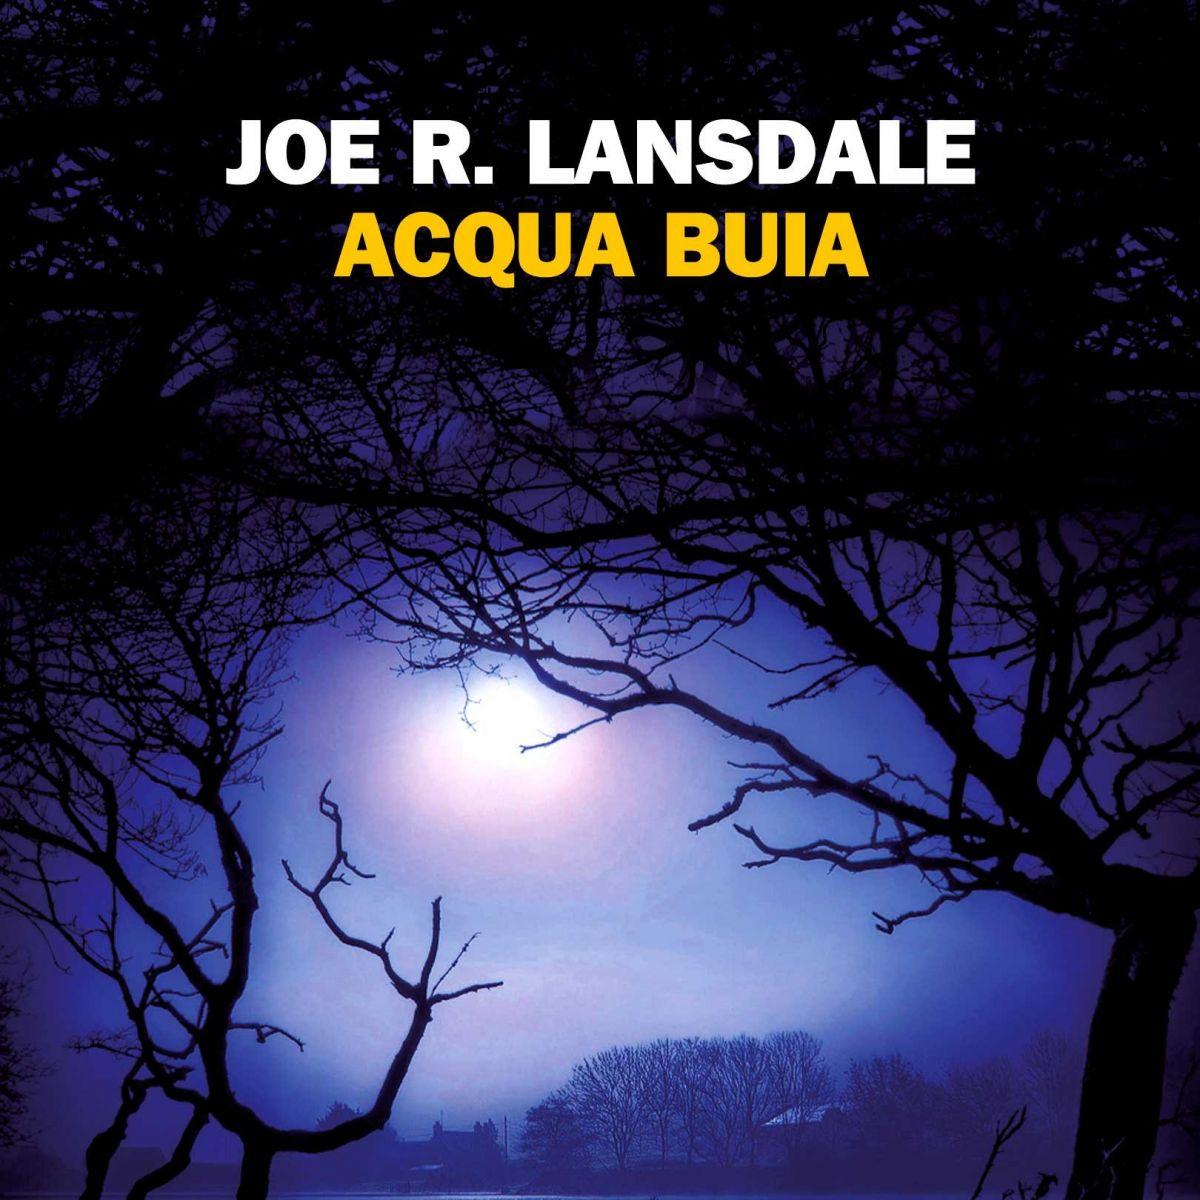 Copertina libro Acqua buia di Joe R. Lansdale